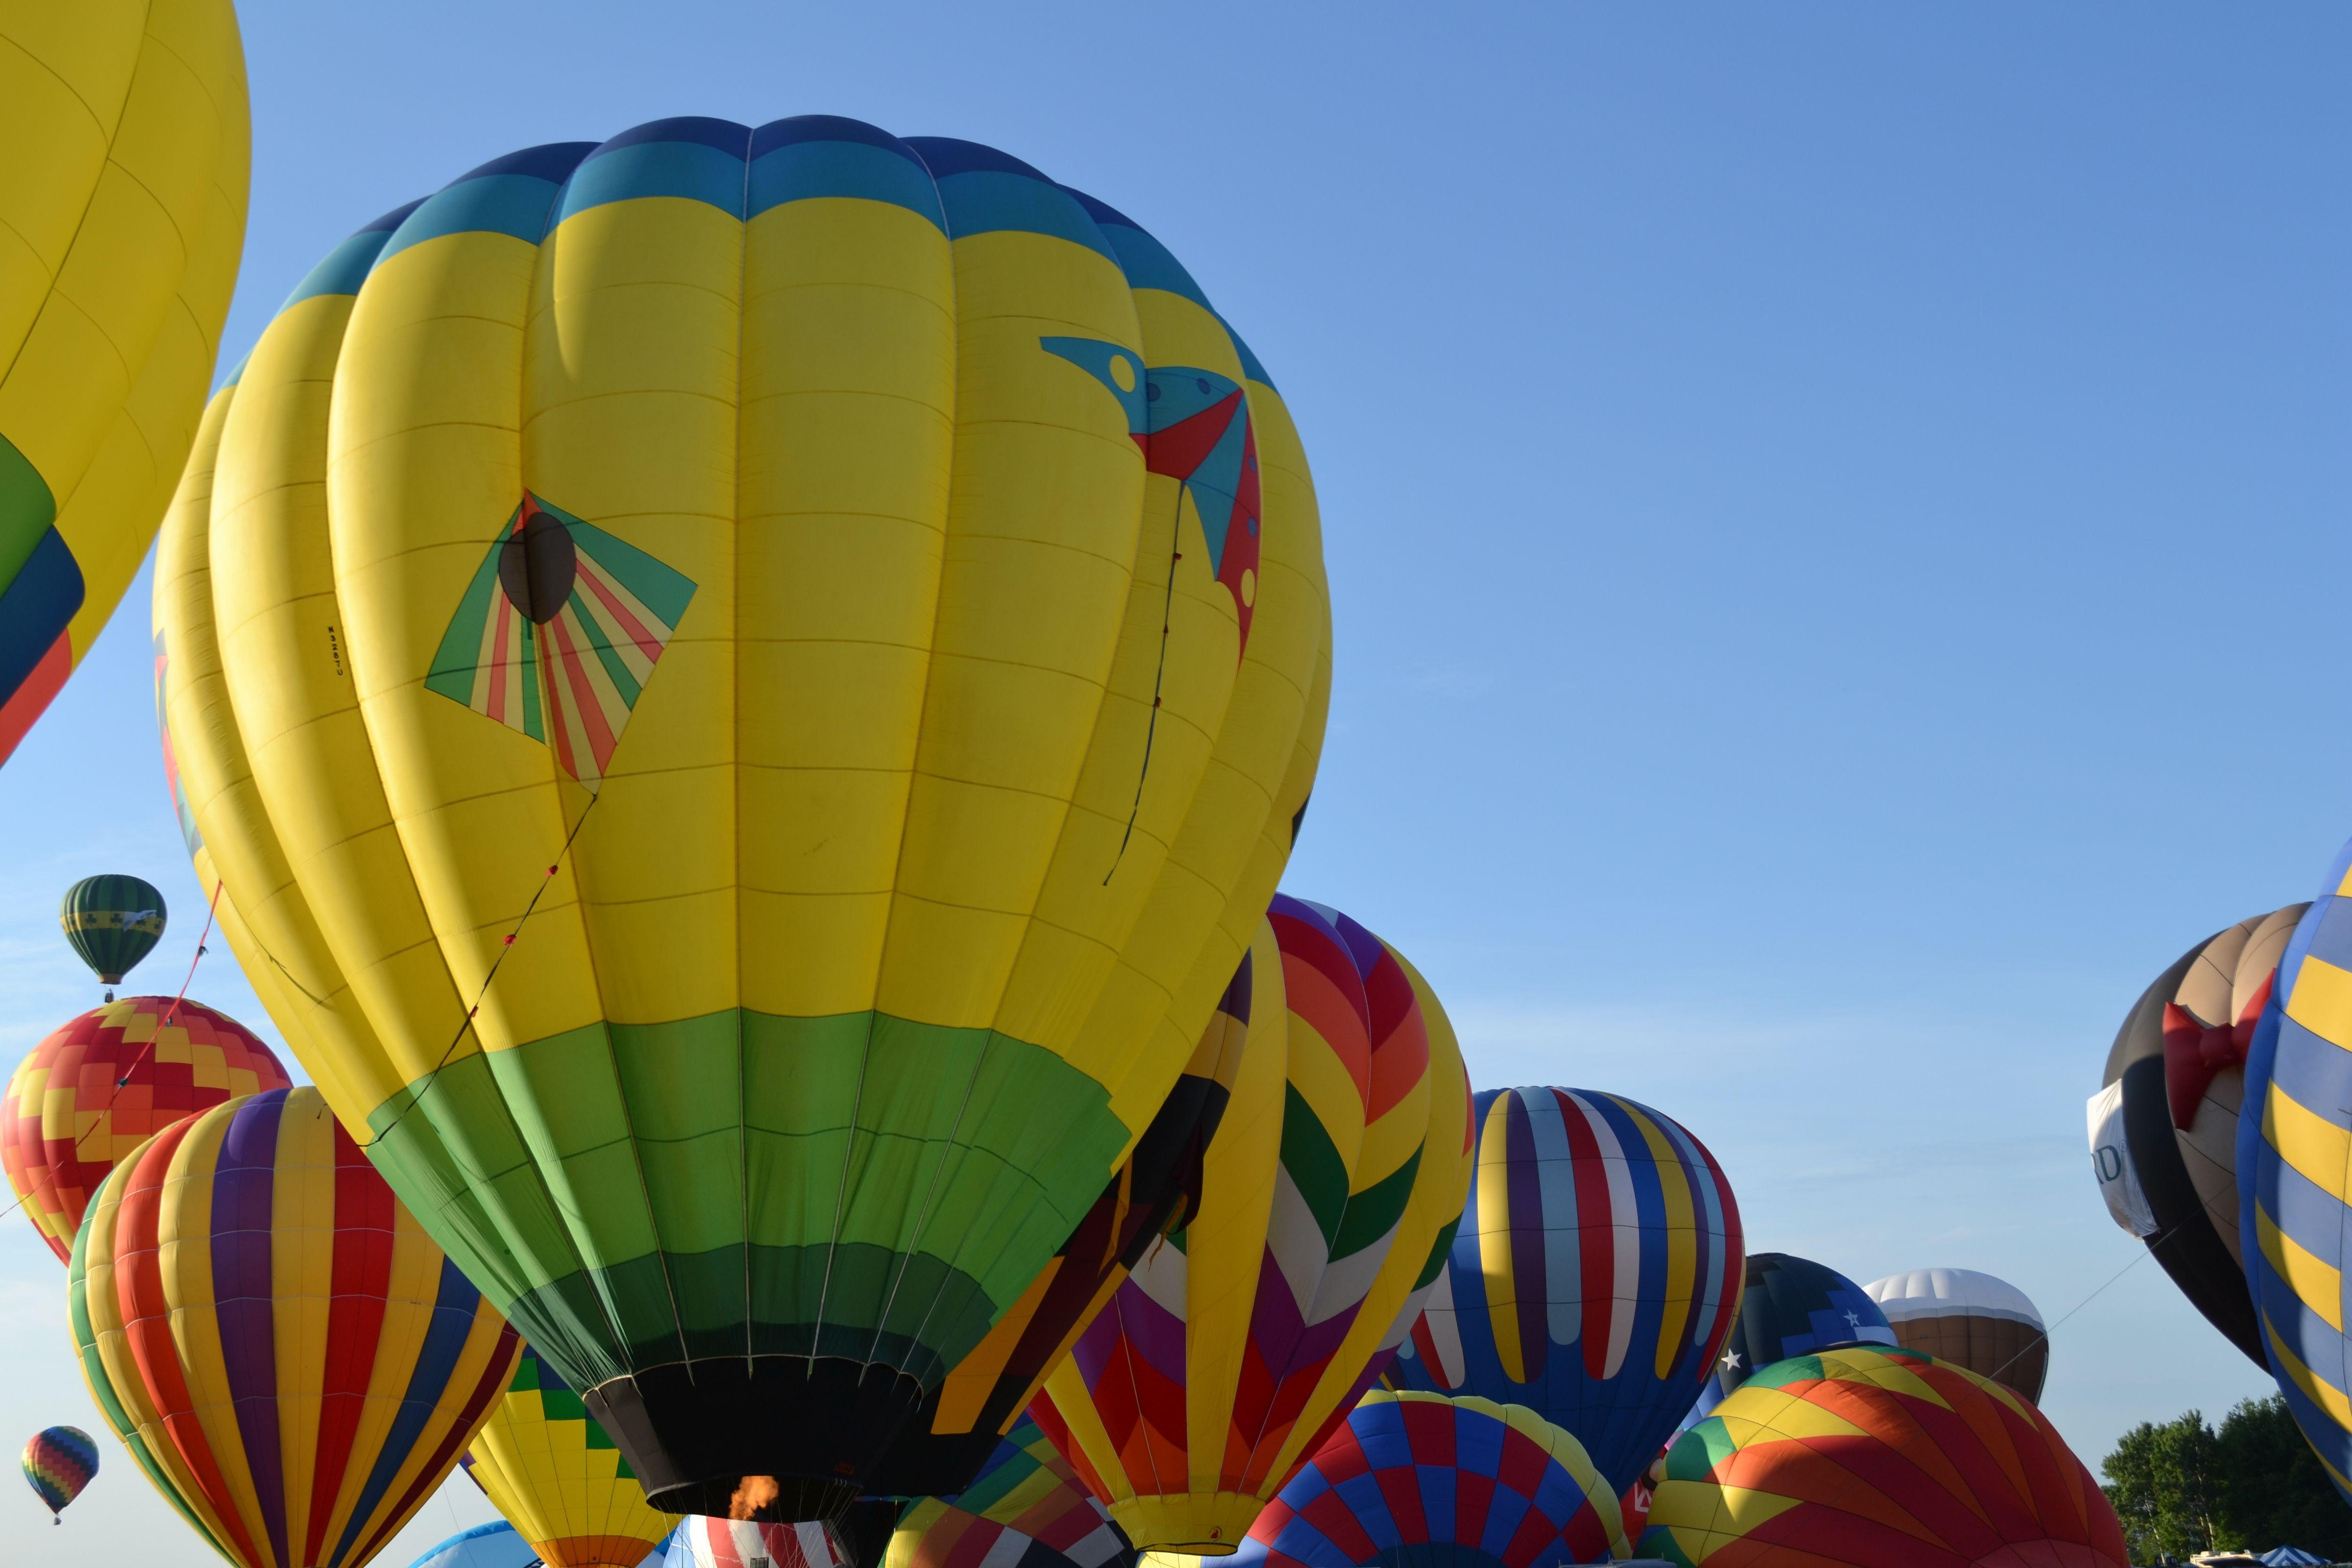 NJ Quickcheck Balloon Festival! July 2628. Whitehouse